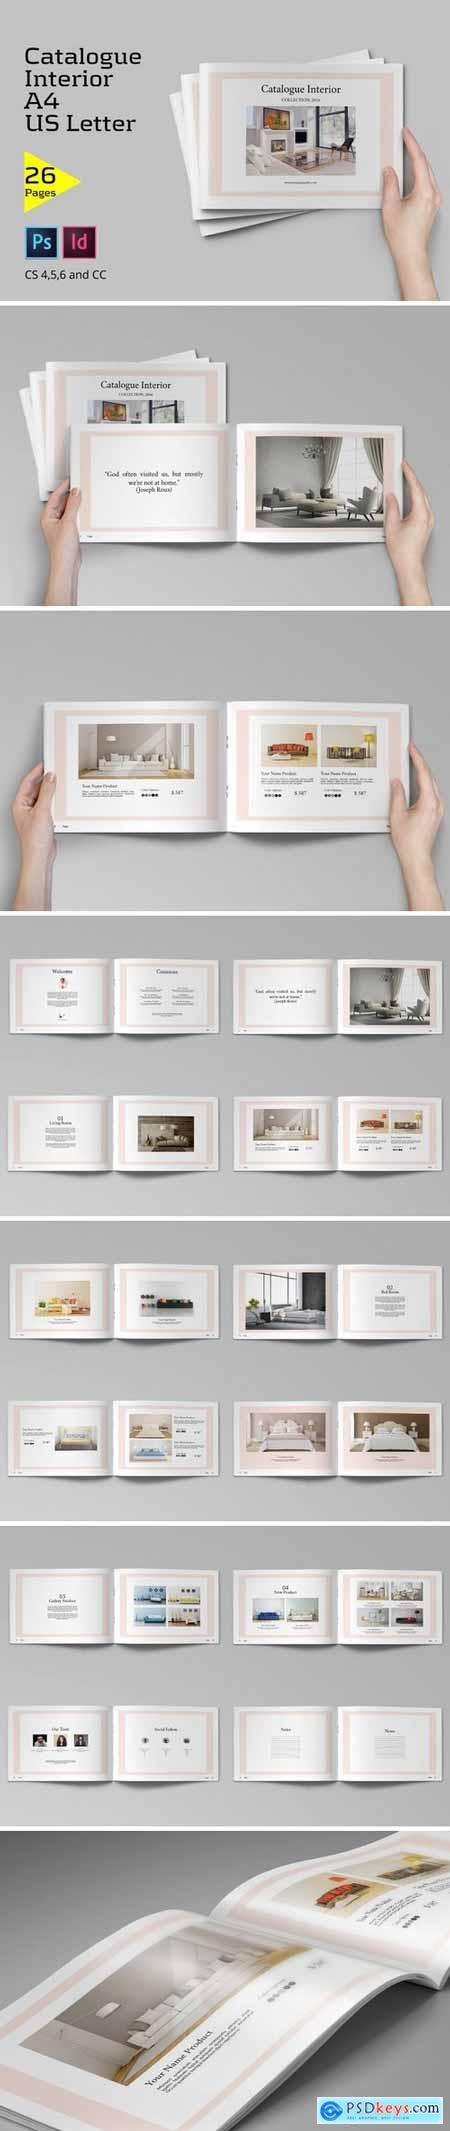 Creativemarket Catalogue Interior